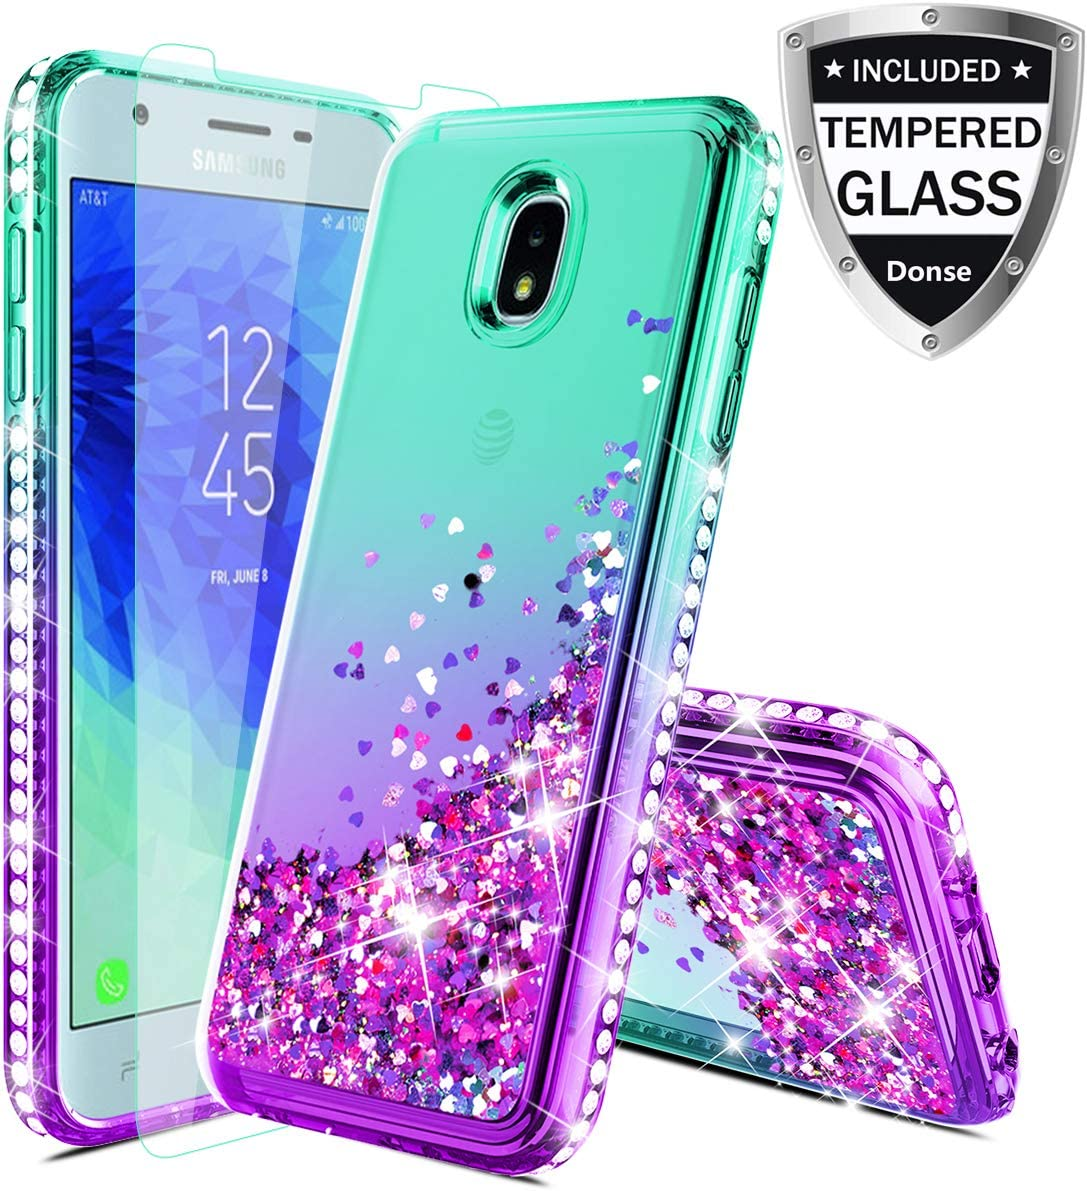 Donse Samsung Galaxy J7 Refine Case,Galaxy J7 Star Case/J7 Crown/J7 2018/J7V 2nd Gen/J7 Aero/J7Top Case W/Glass Screen Protector,Glitter Liquid Quicksand Sparkle Diamond for Girls Women,Mint/Purple